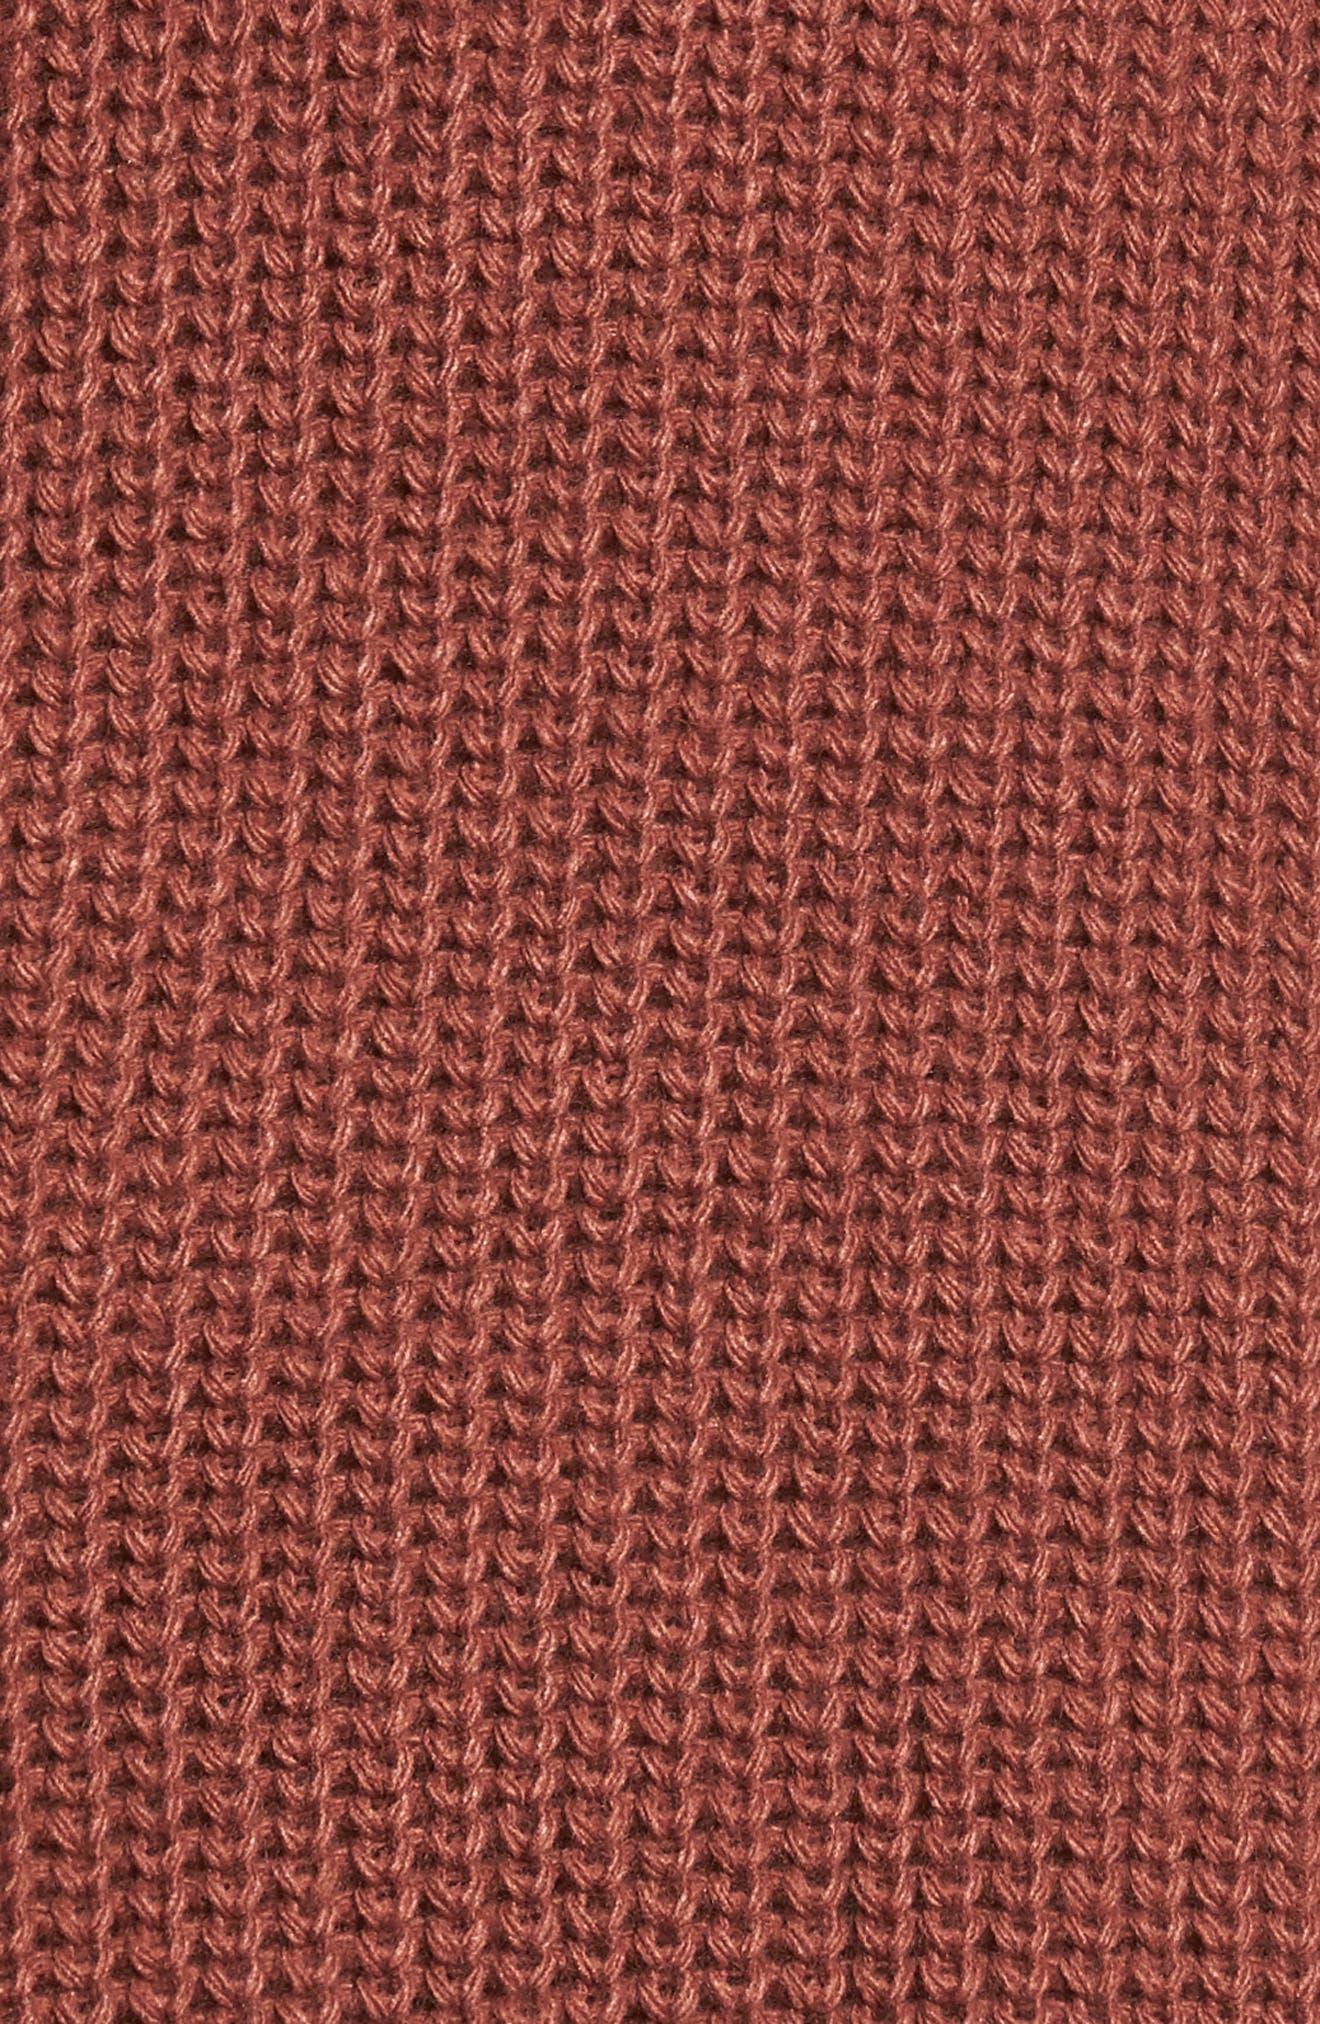 Foldover Off the Shoulder Sweater Dress,                             Alternate thumbnail 19, color,